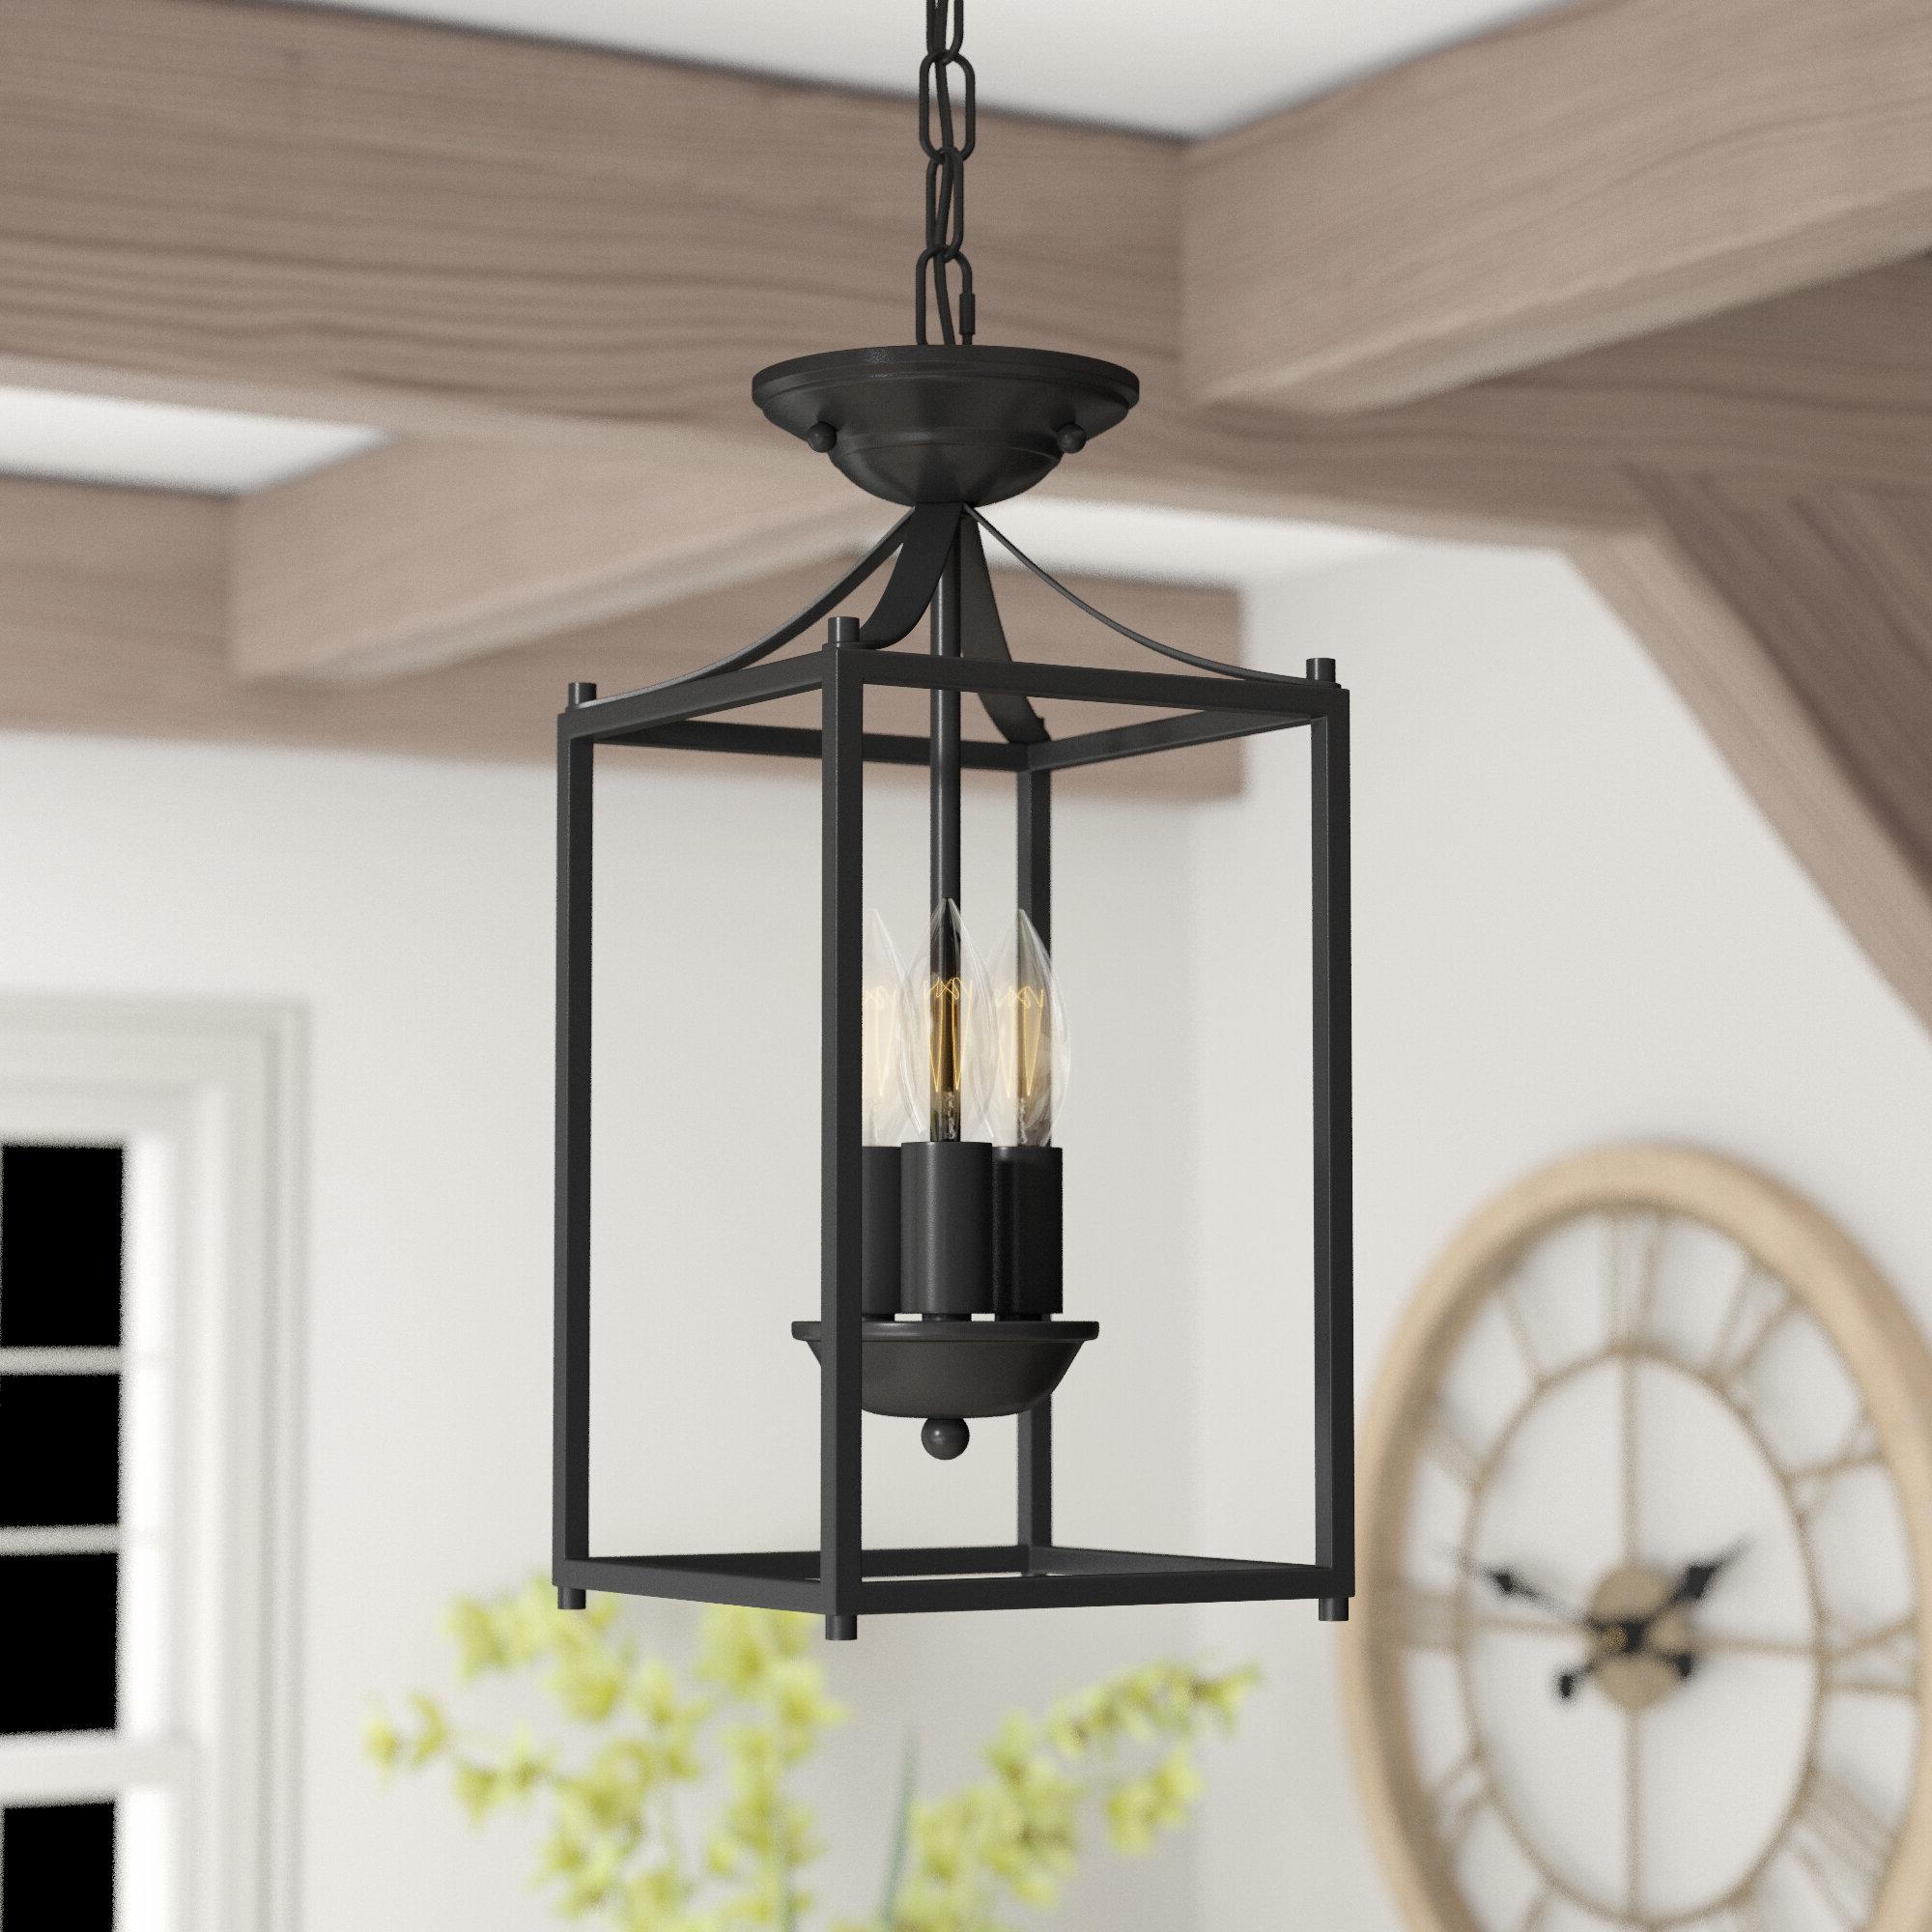 Leiters 3 Light Lantern Geometric Pendants Within Best And Newest Barryton 3 Light Lantern Square Pendant (View 13 of 20)